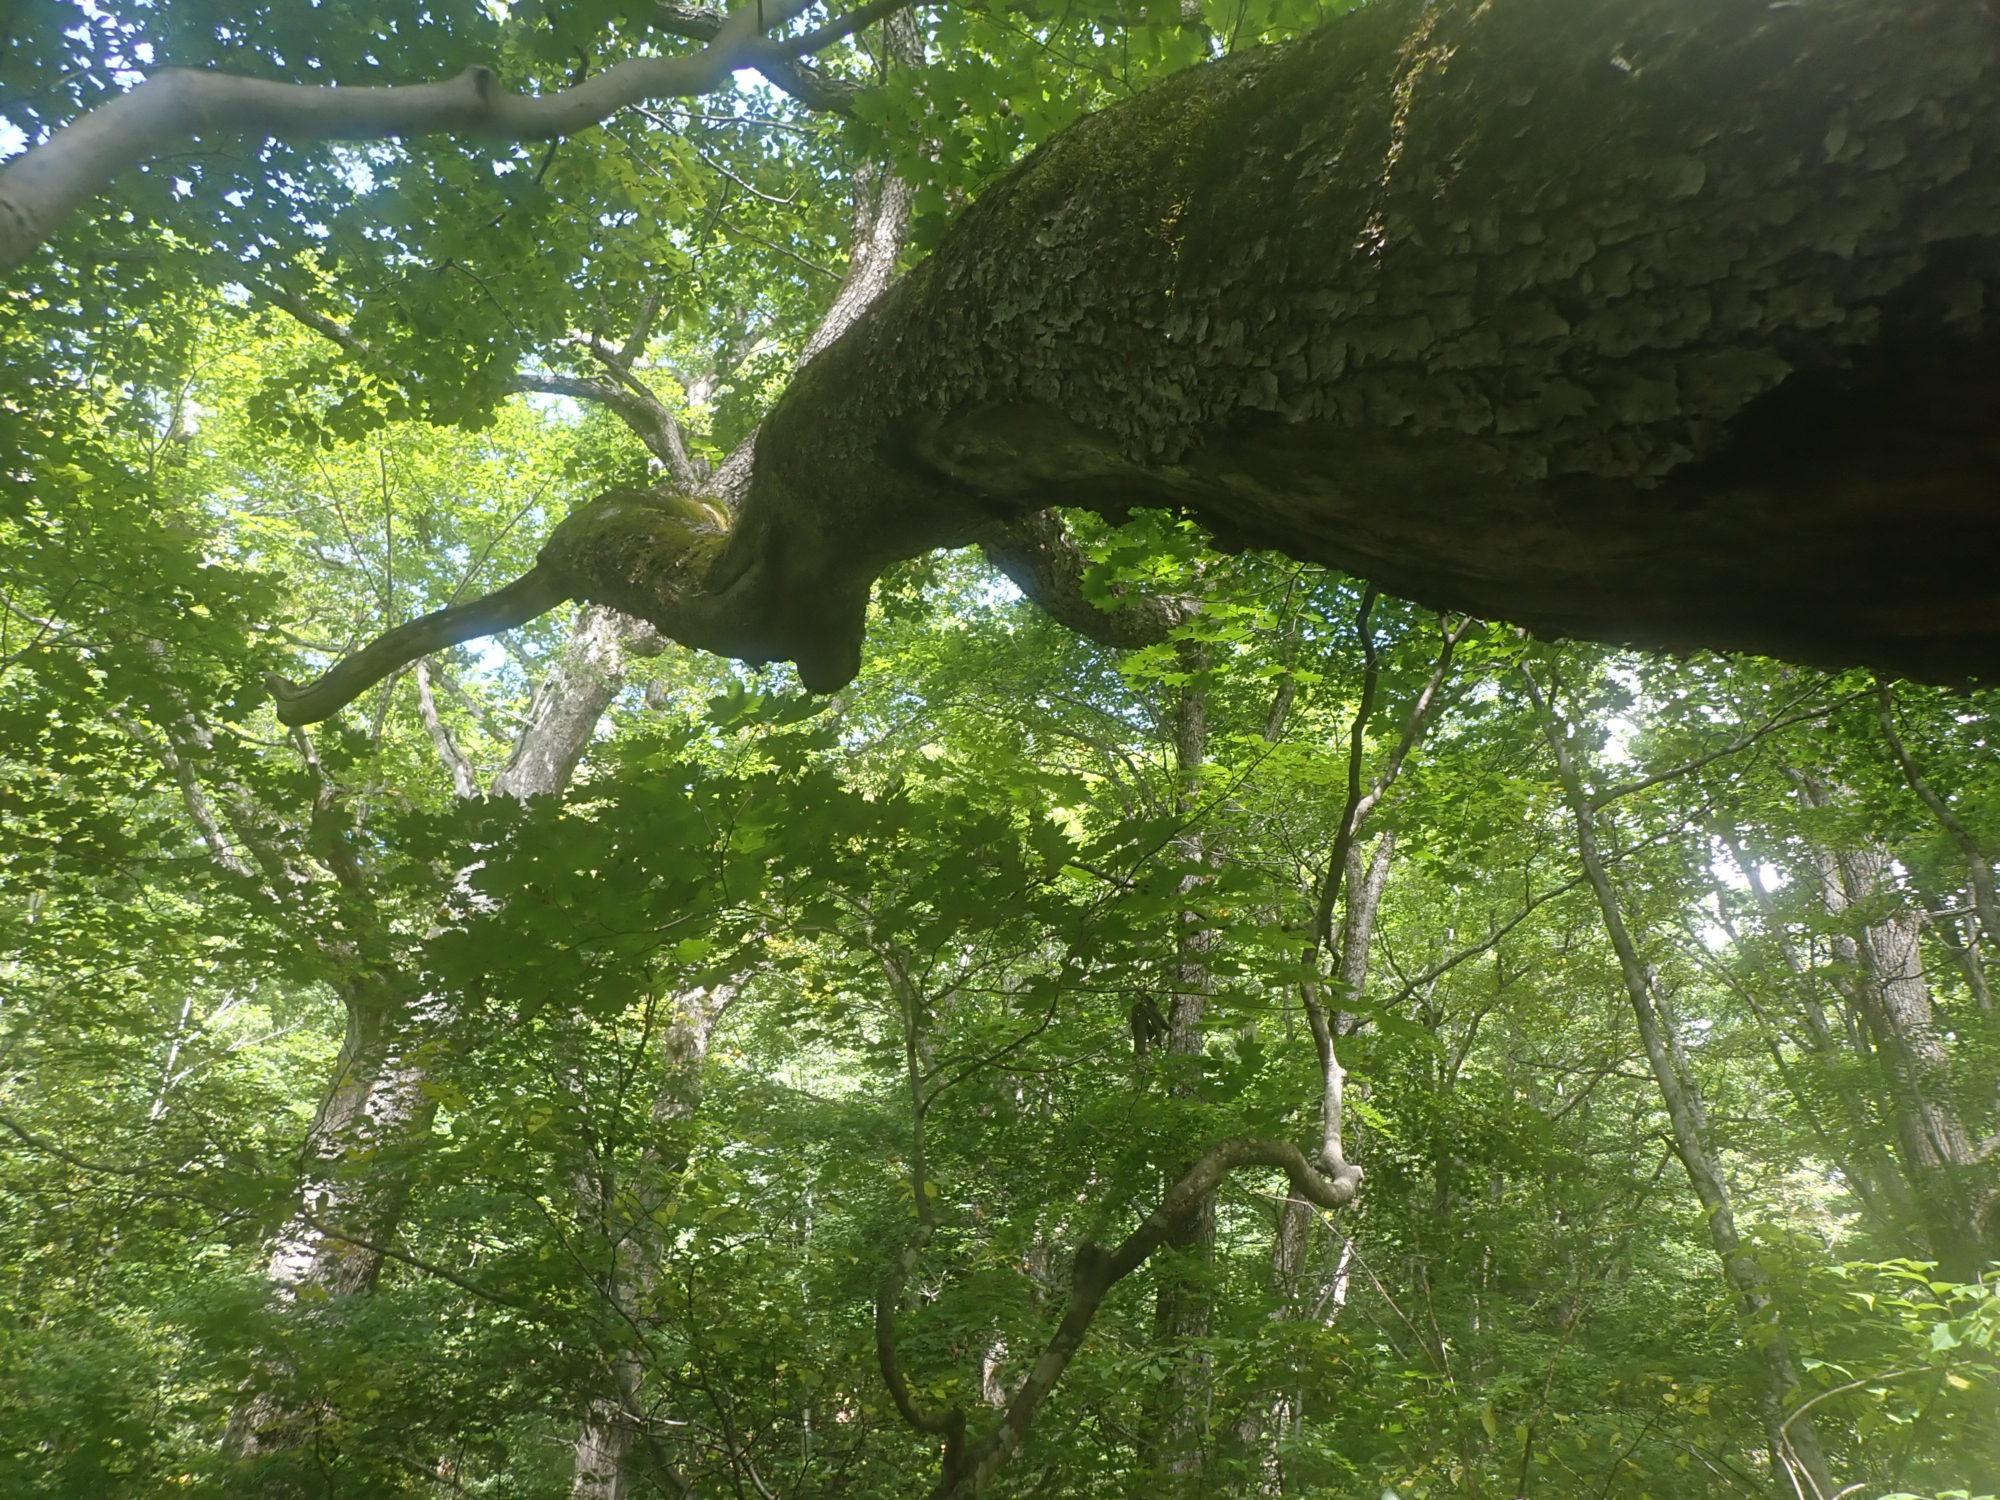 2020 Sep とにかく美しい原生林、奥志賀渓谷